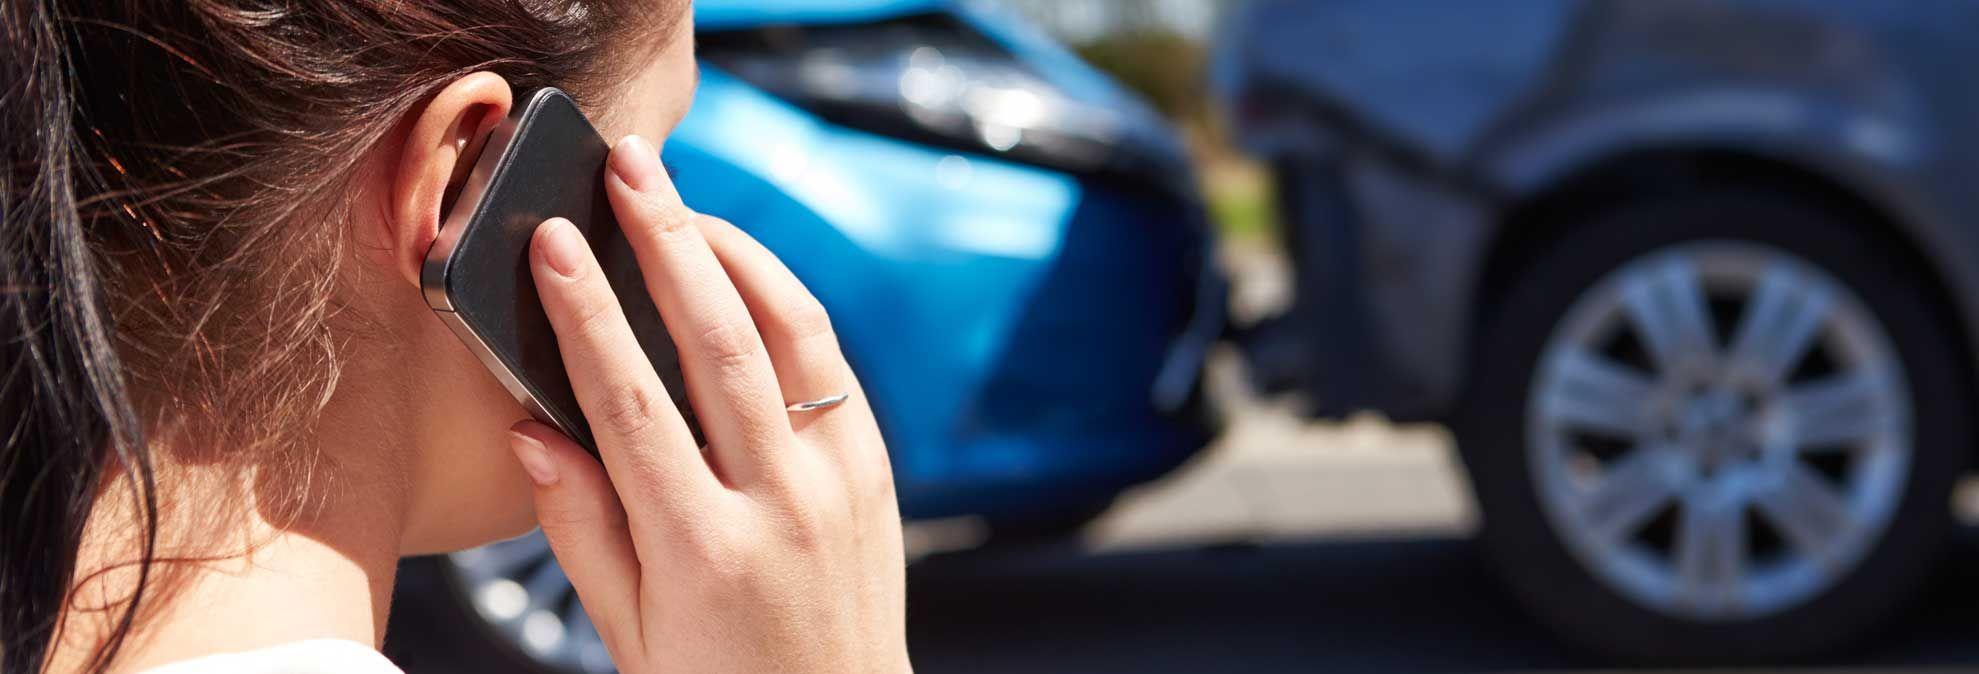 Key Car Insurance Terms Car Insurance Cheap Car Insurance